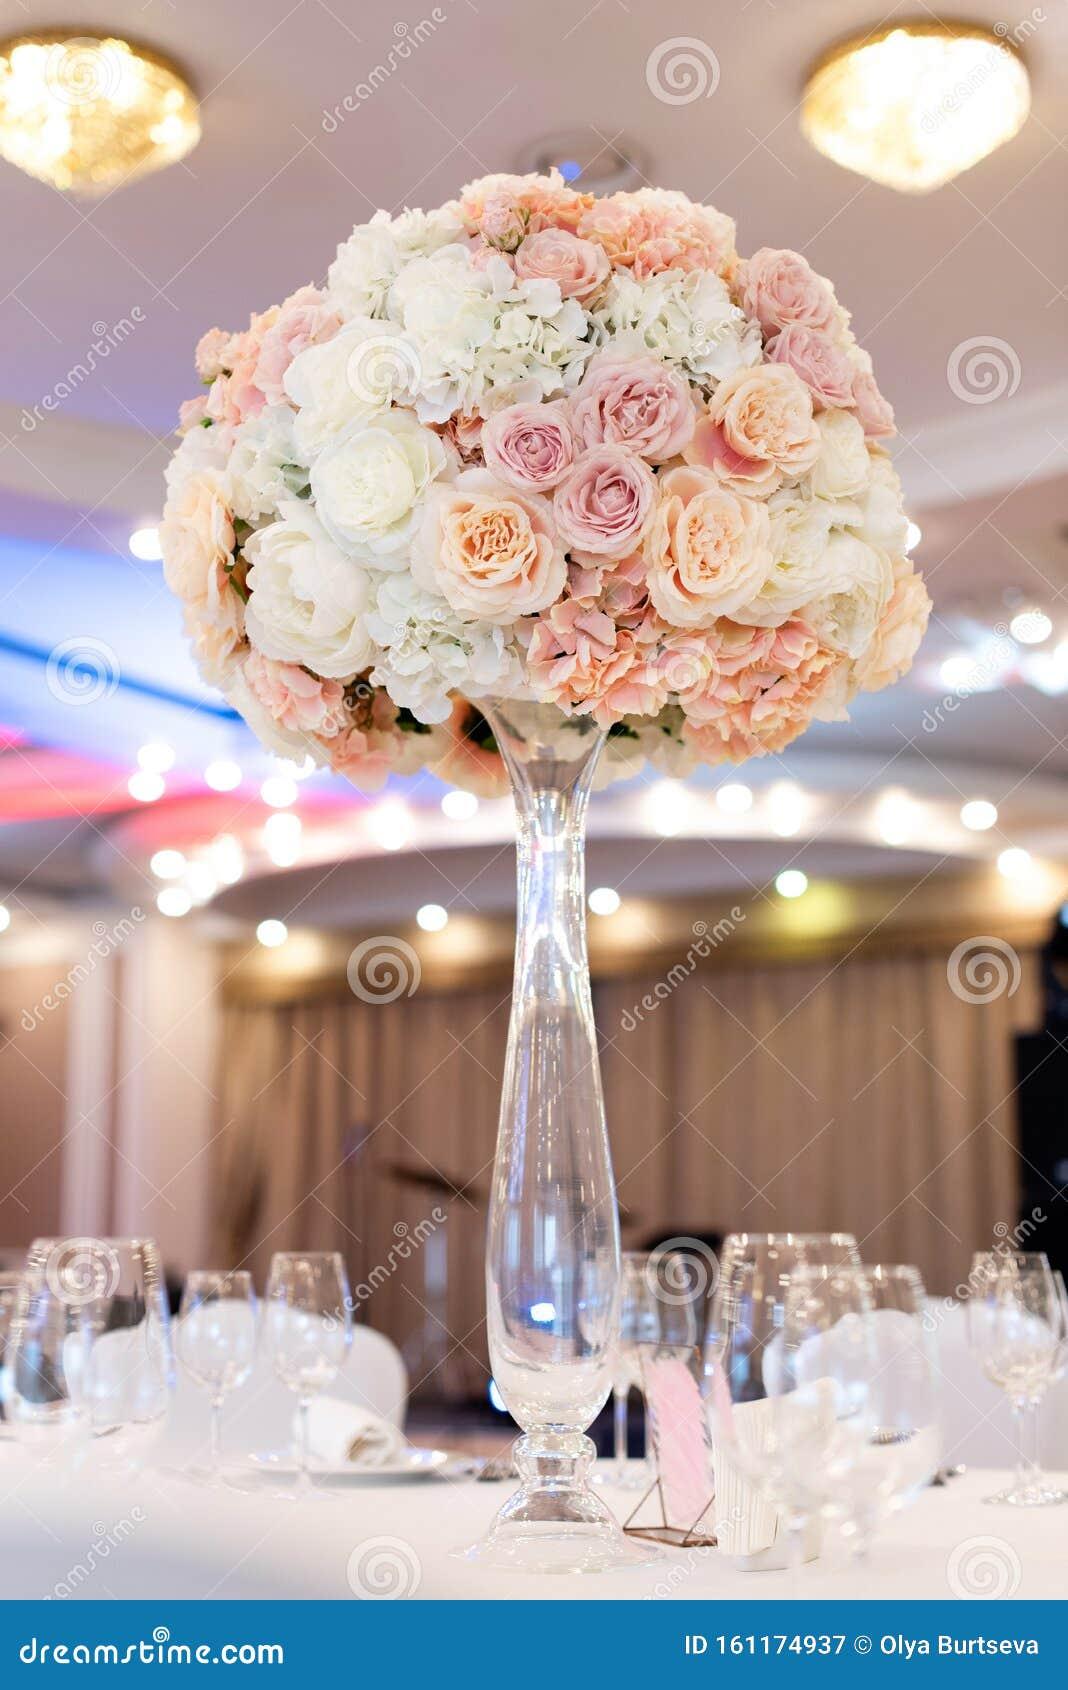 Wedding Flowers On A Tall Glass Vase Wedding Decor In Pastel Shades Stock Image Image Of Fashionable Celebration 161174937